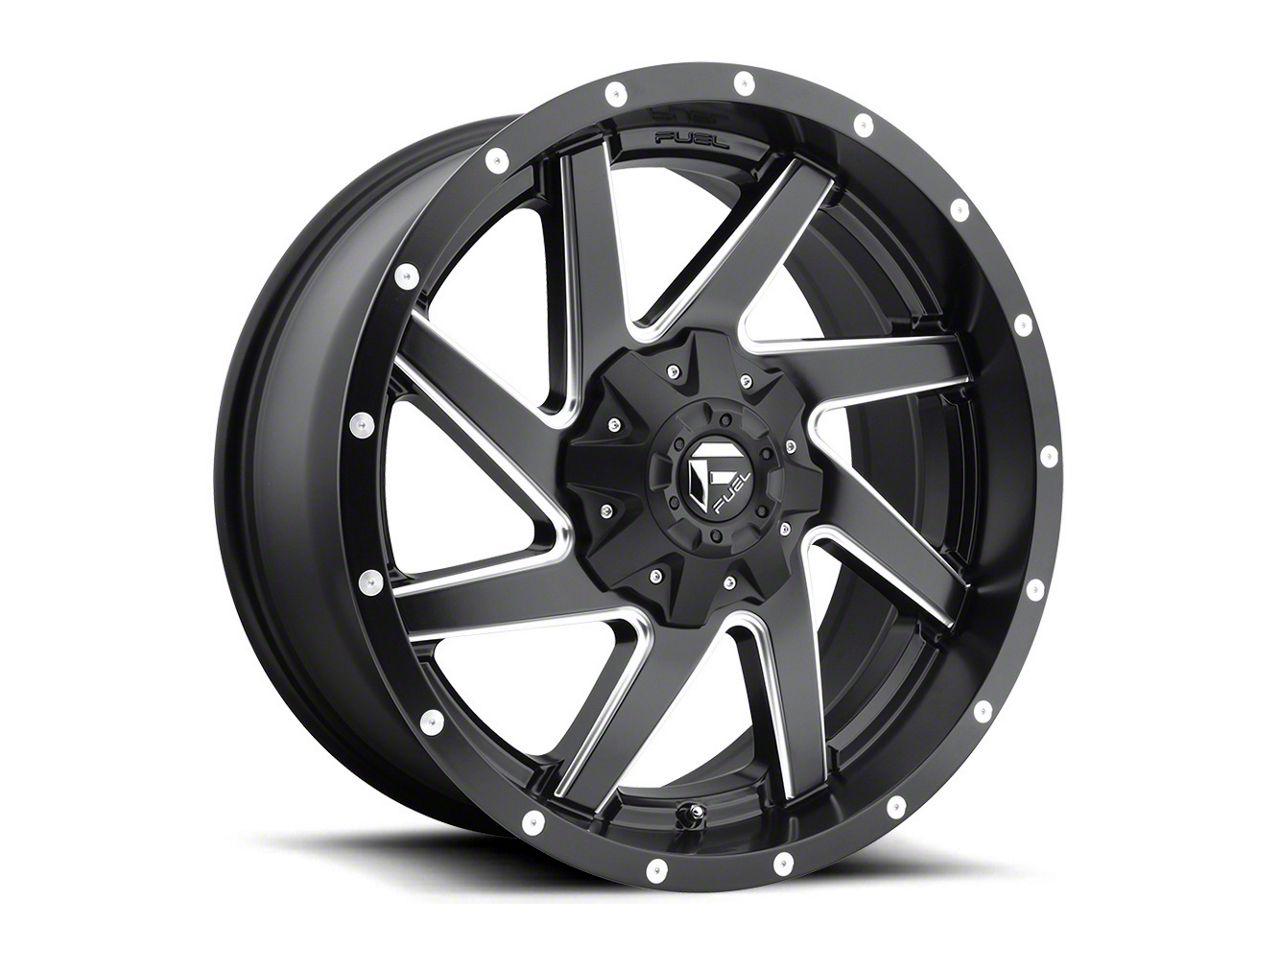 Fuel Wheels Renegade Matte Black Milled 6-Lug Wheel - 20x10 (99-18 Silverado 1500)